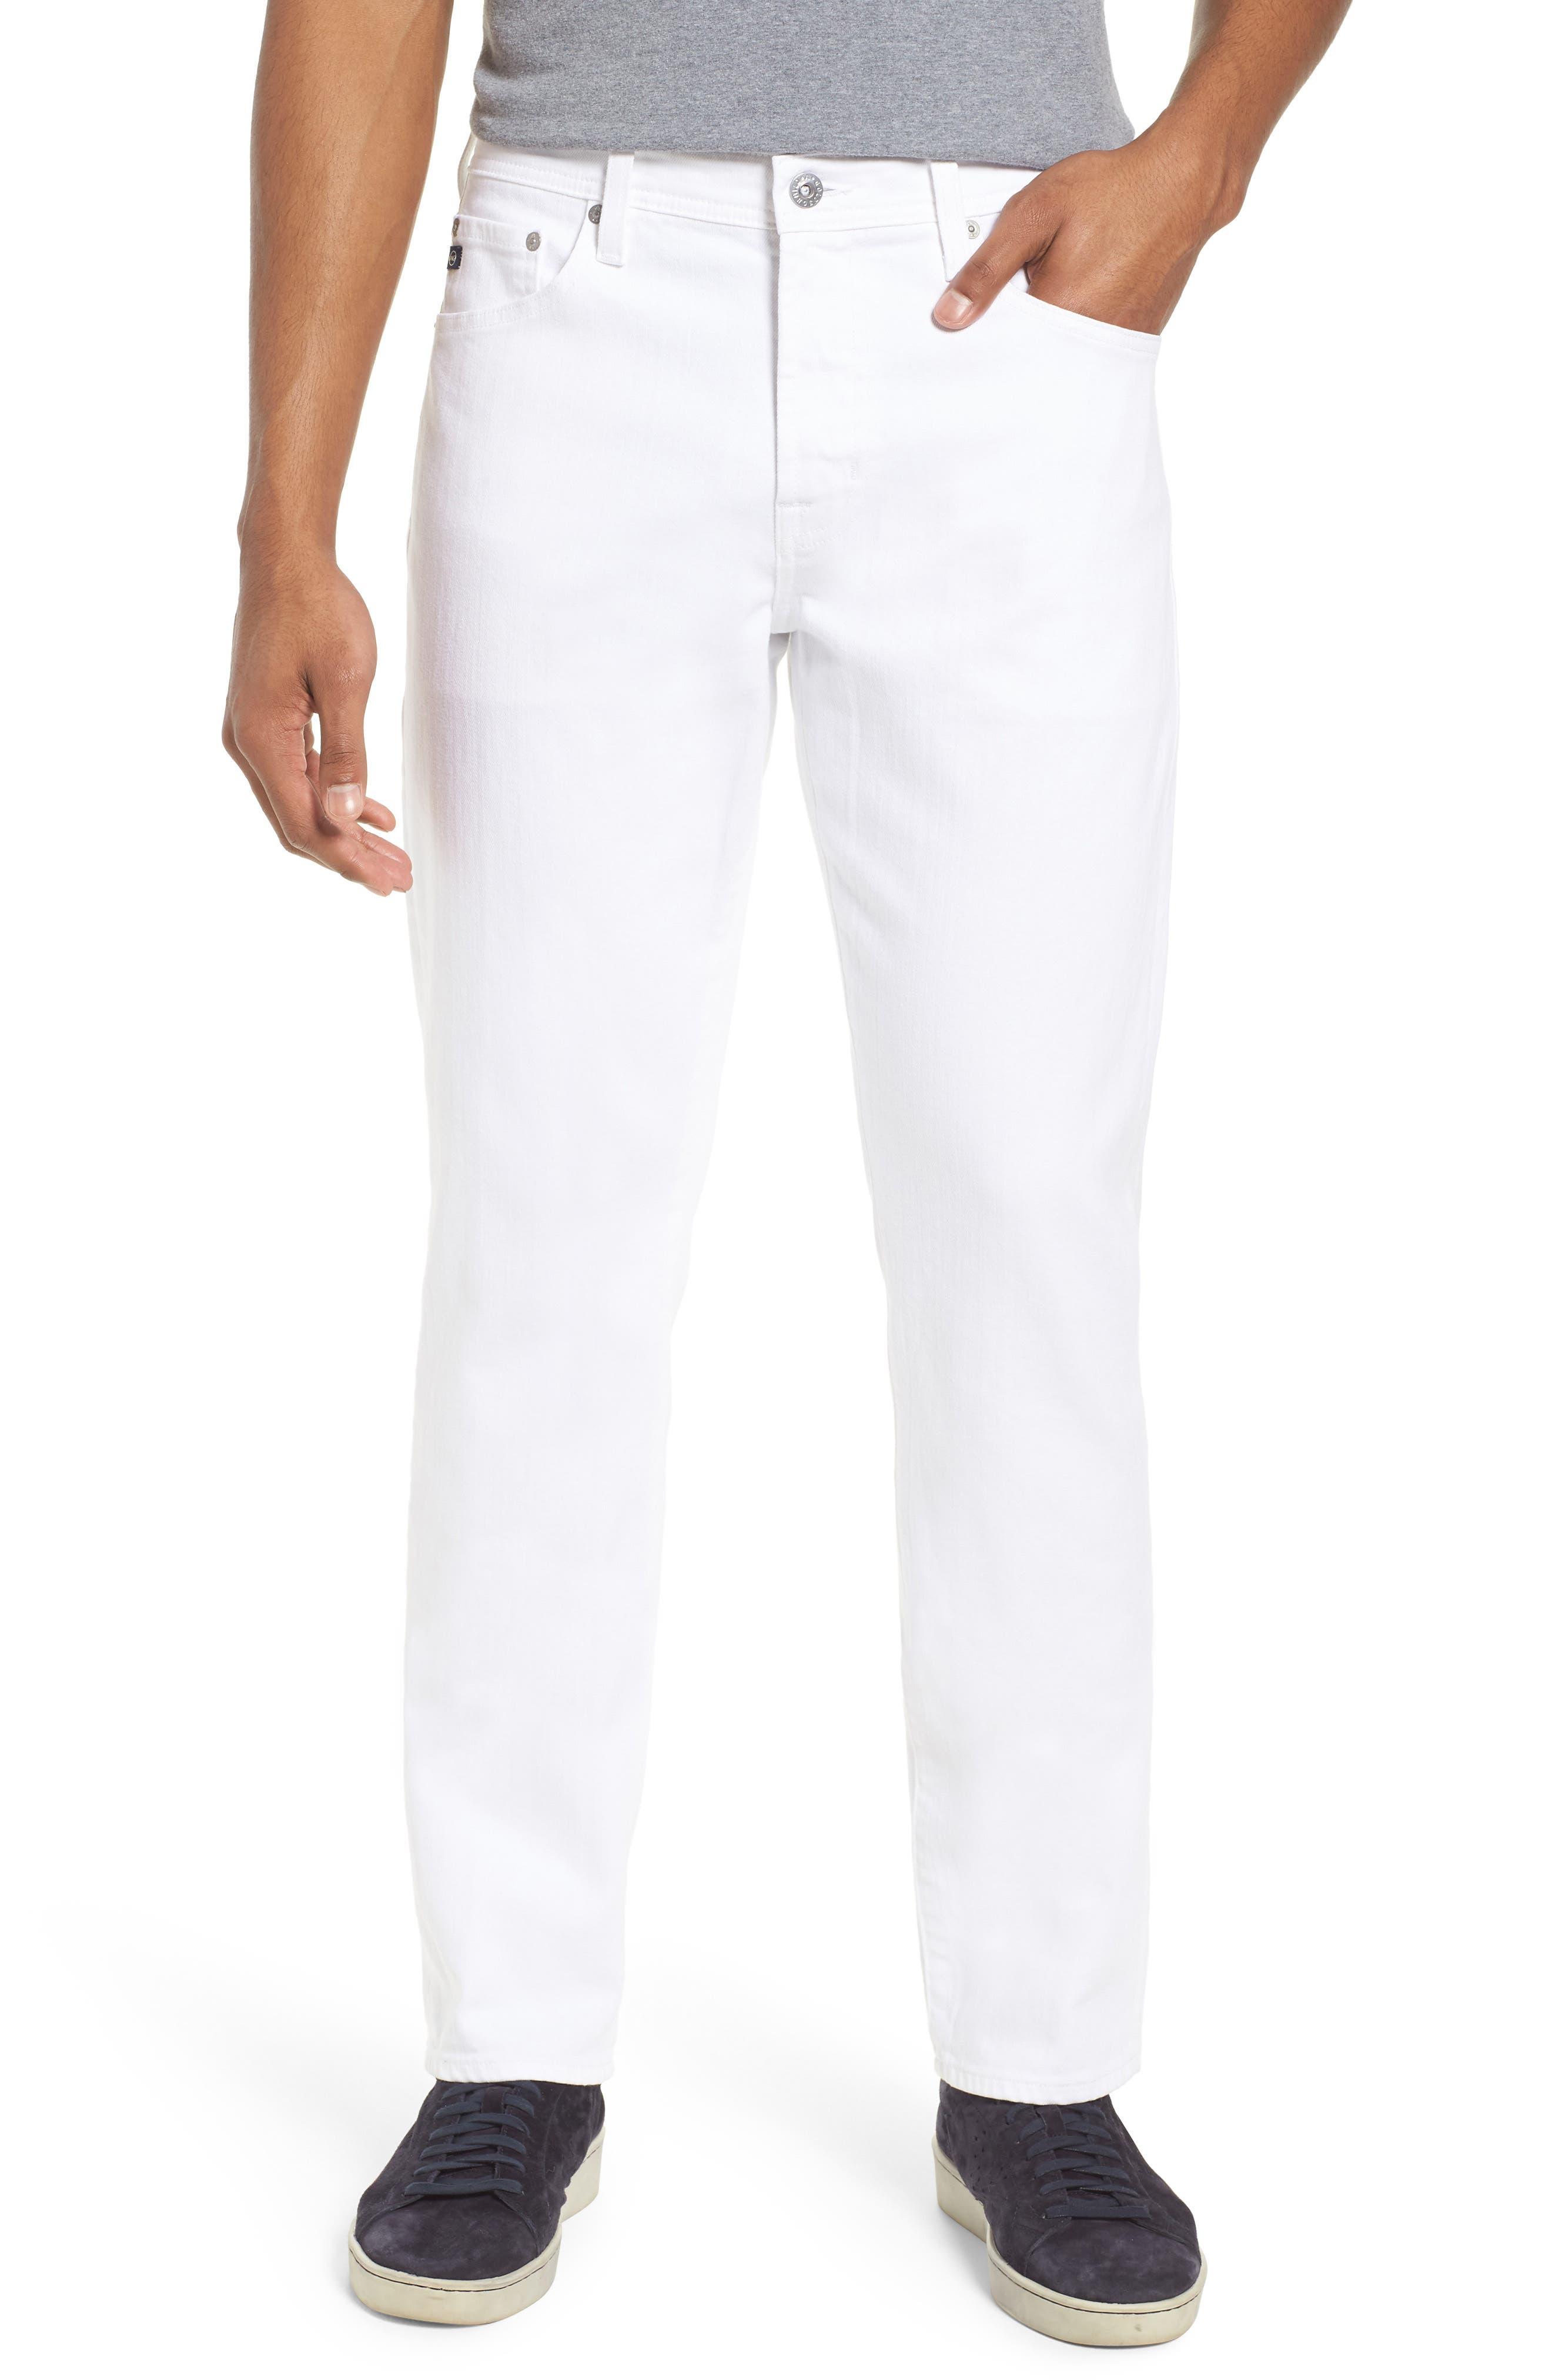 Everett Slim Straight Leg Jeans,                             Main thumbnail 1, color,                             White